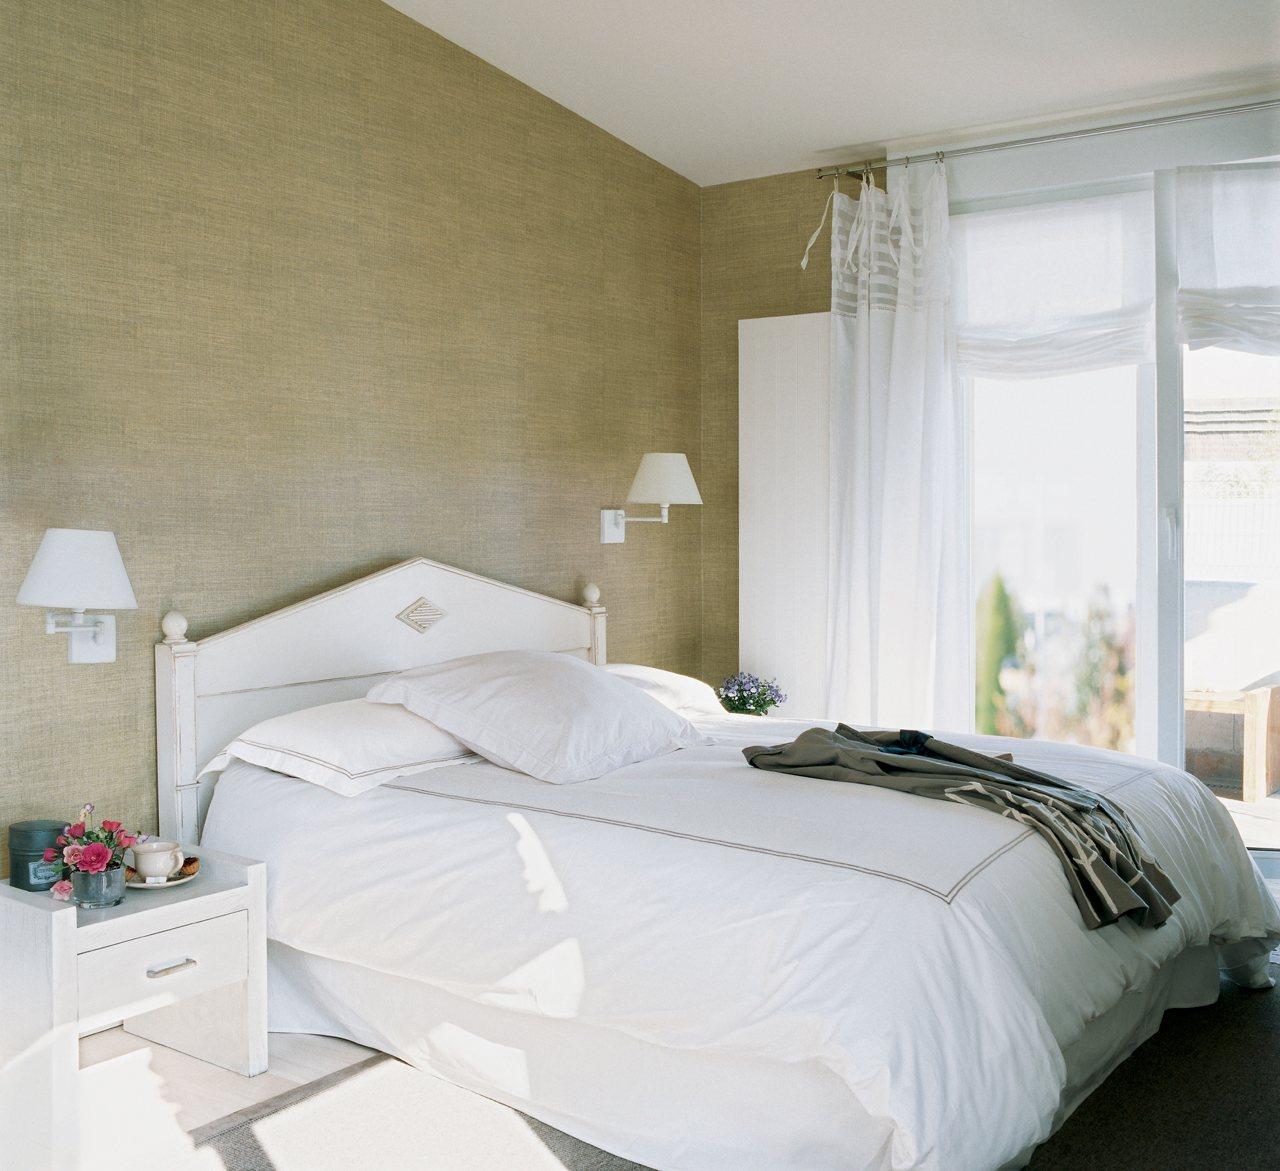 Dormitorios peque os con ideas for Dormitorio cabecero blanco